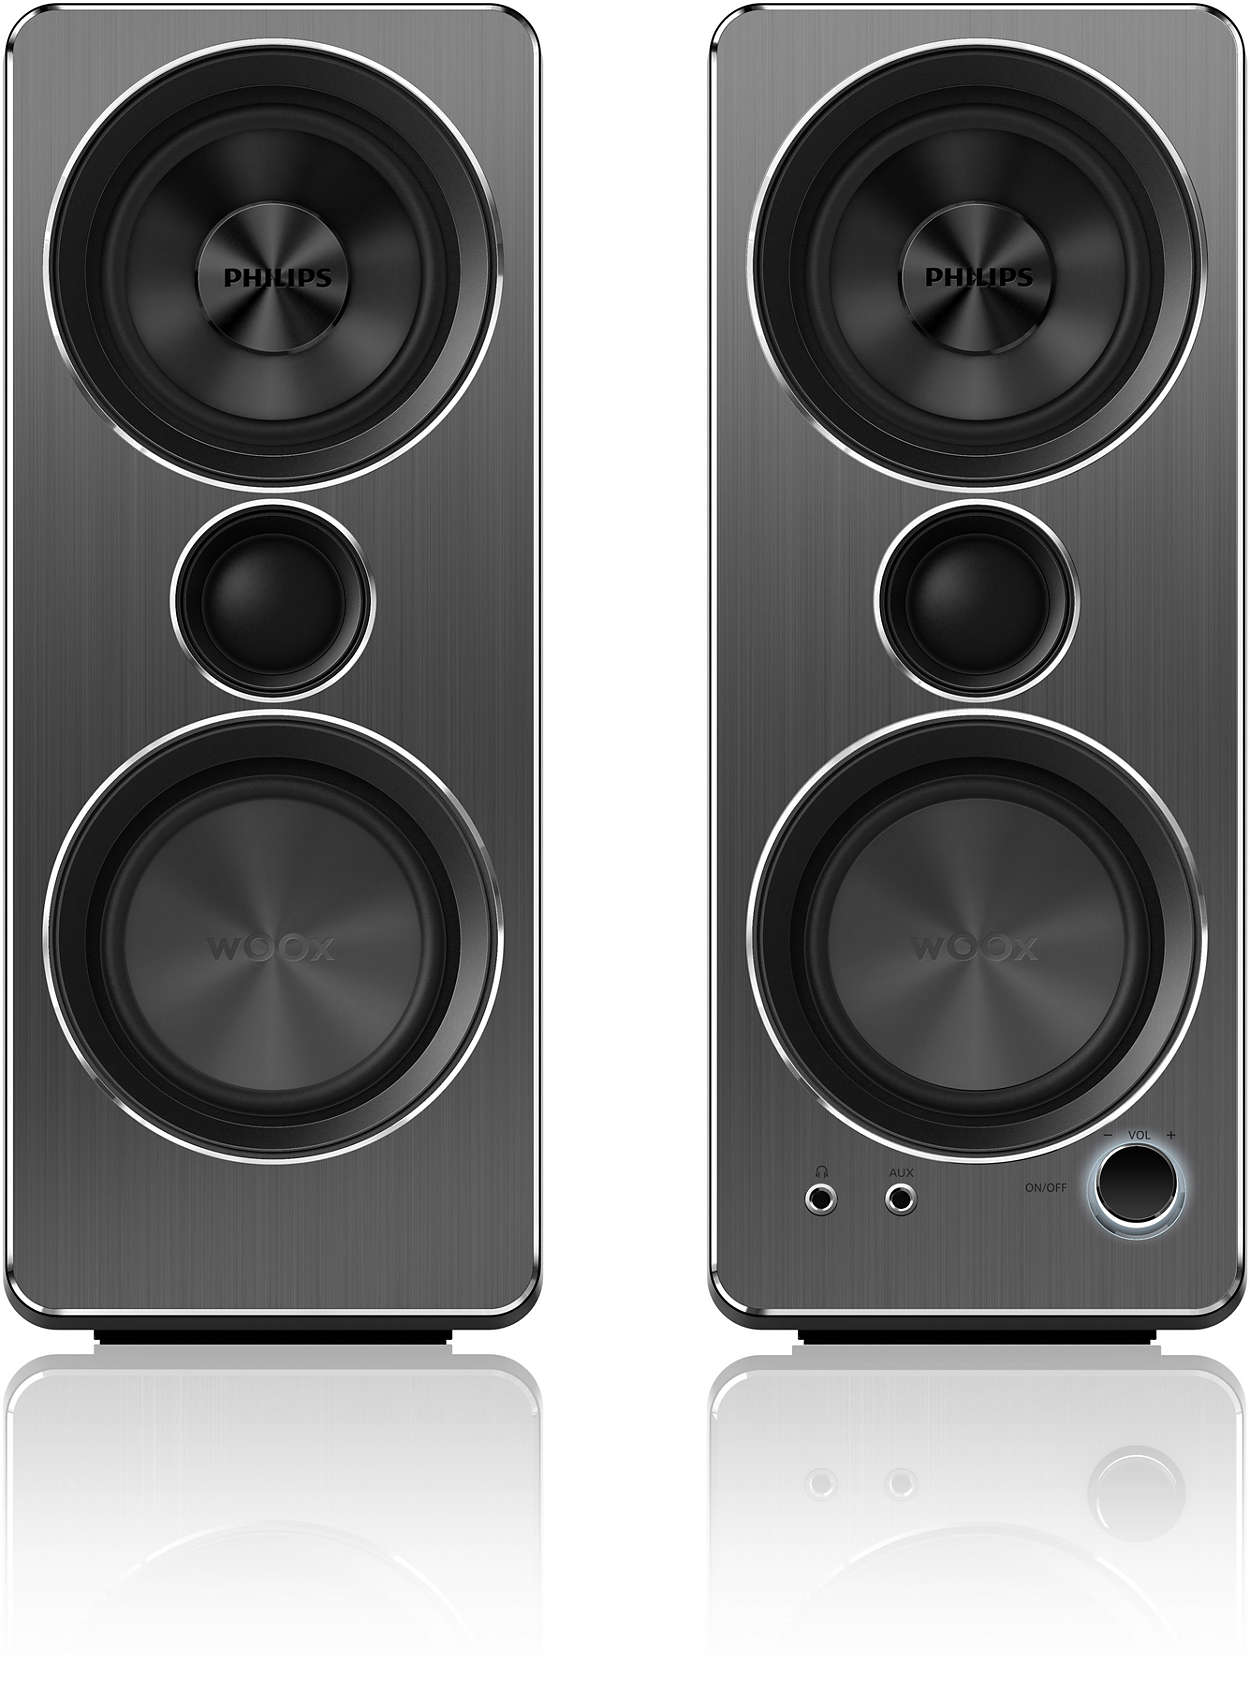 Multimedia Speakers 2 0 Spa8210 37 Philips